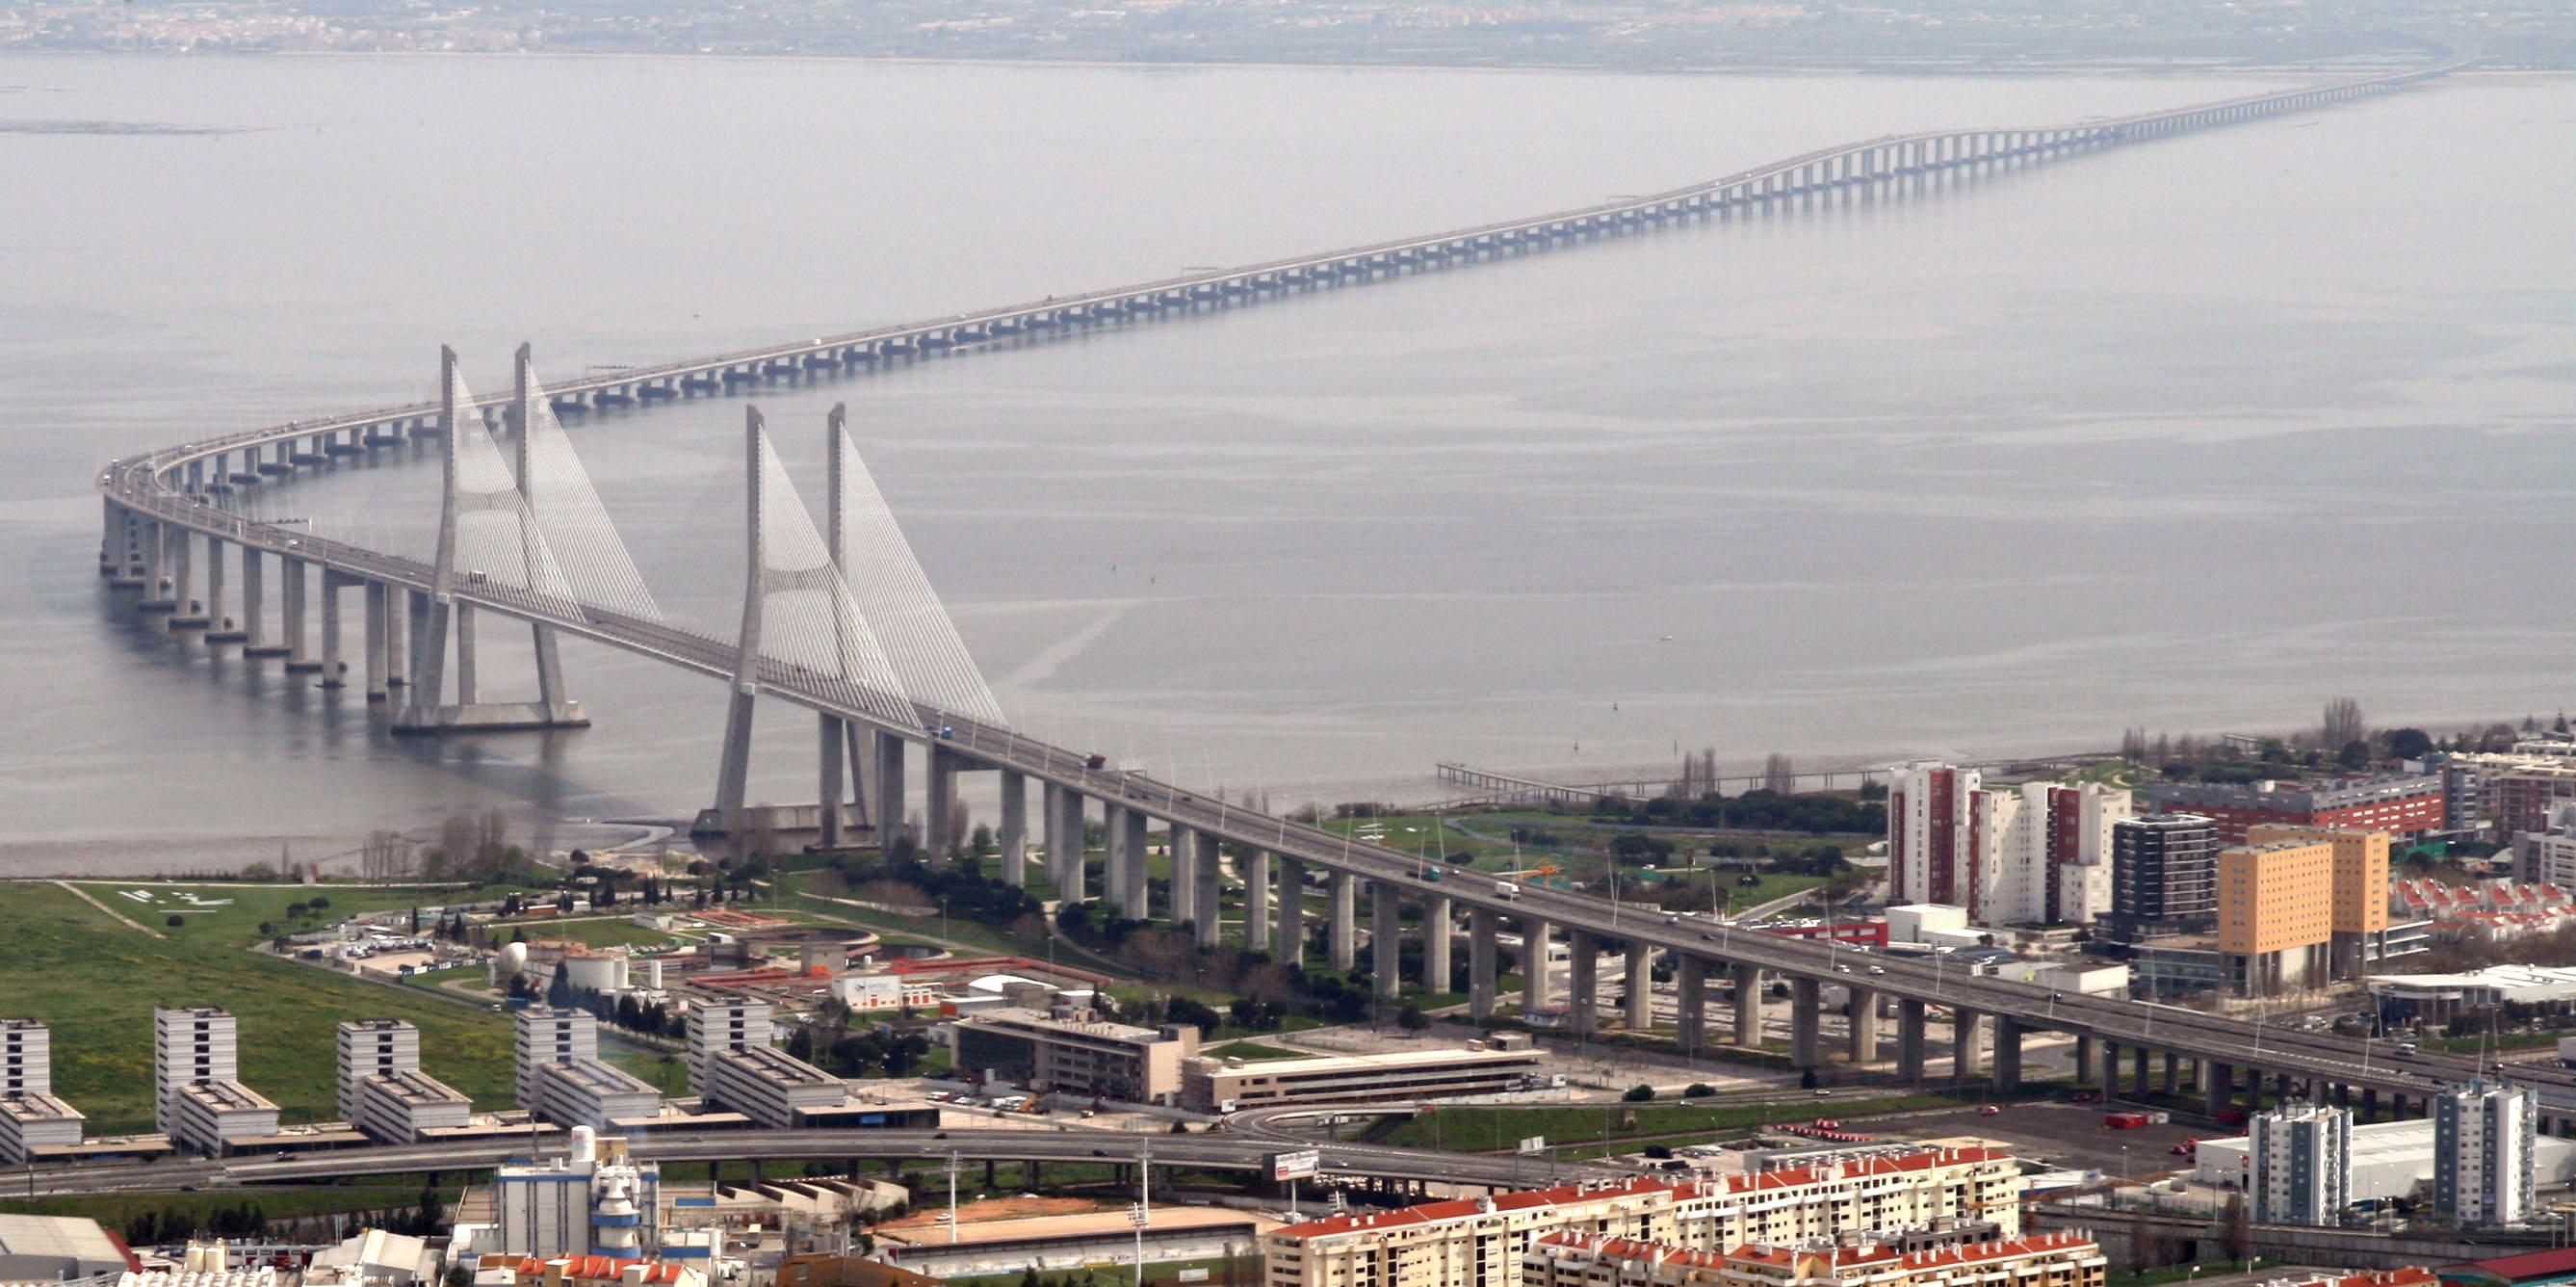 Vasco da Gama Bridge - Wikipedia